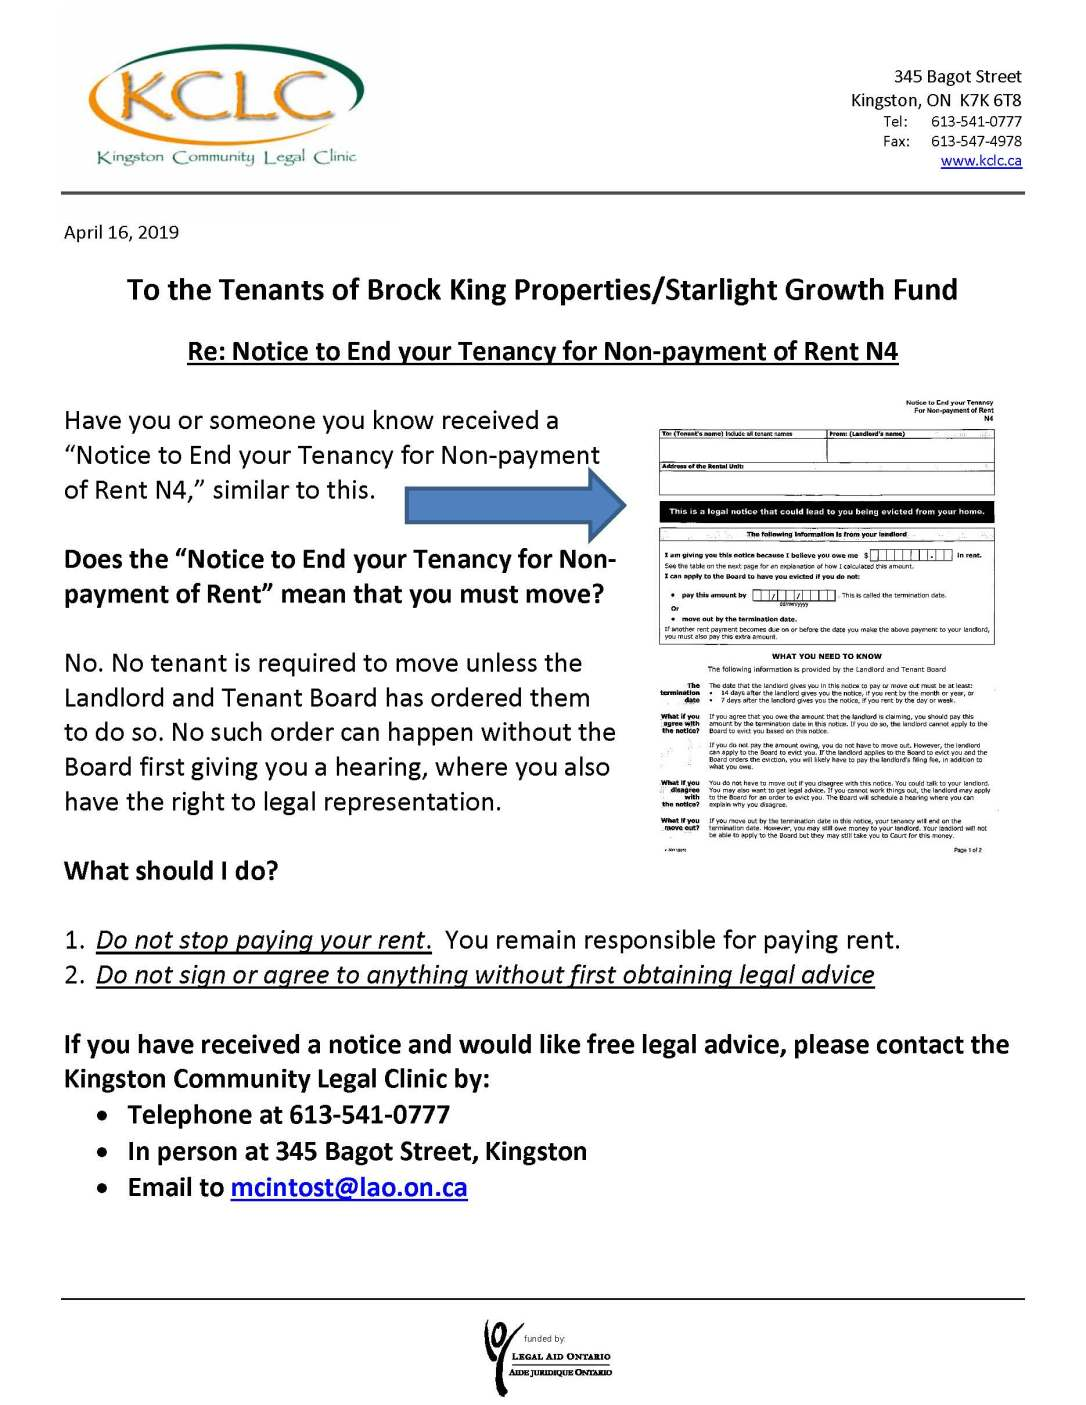 Brock King - Starlight N4 circular 2019 04 15